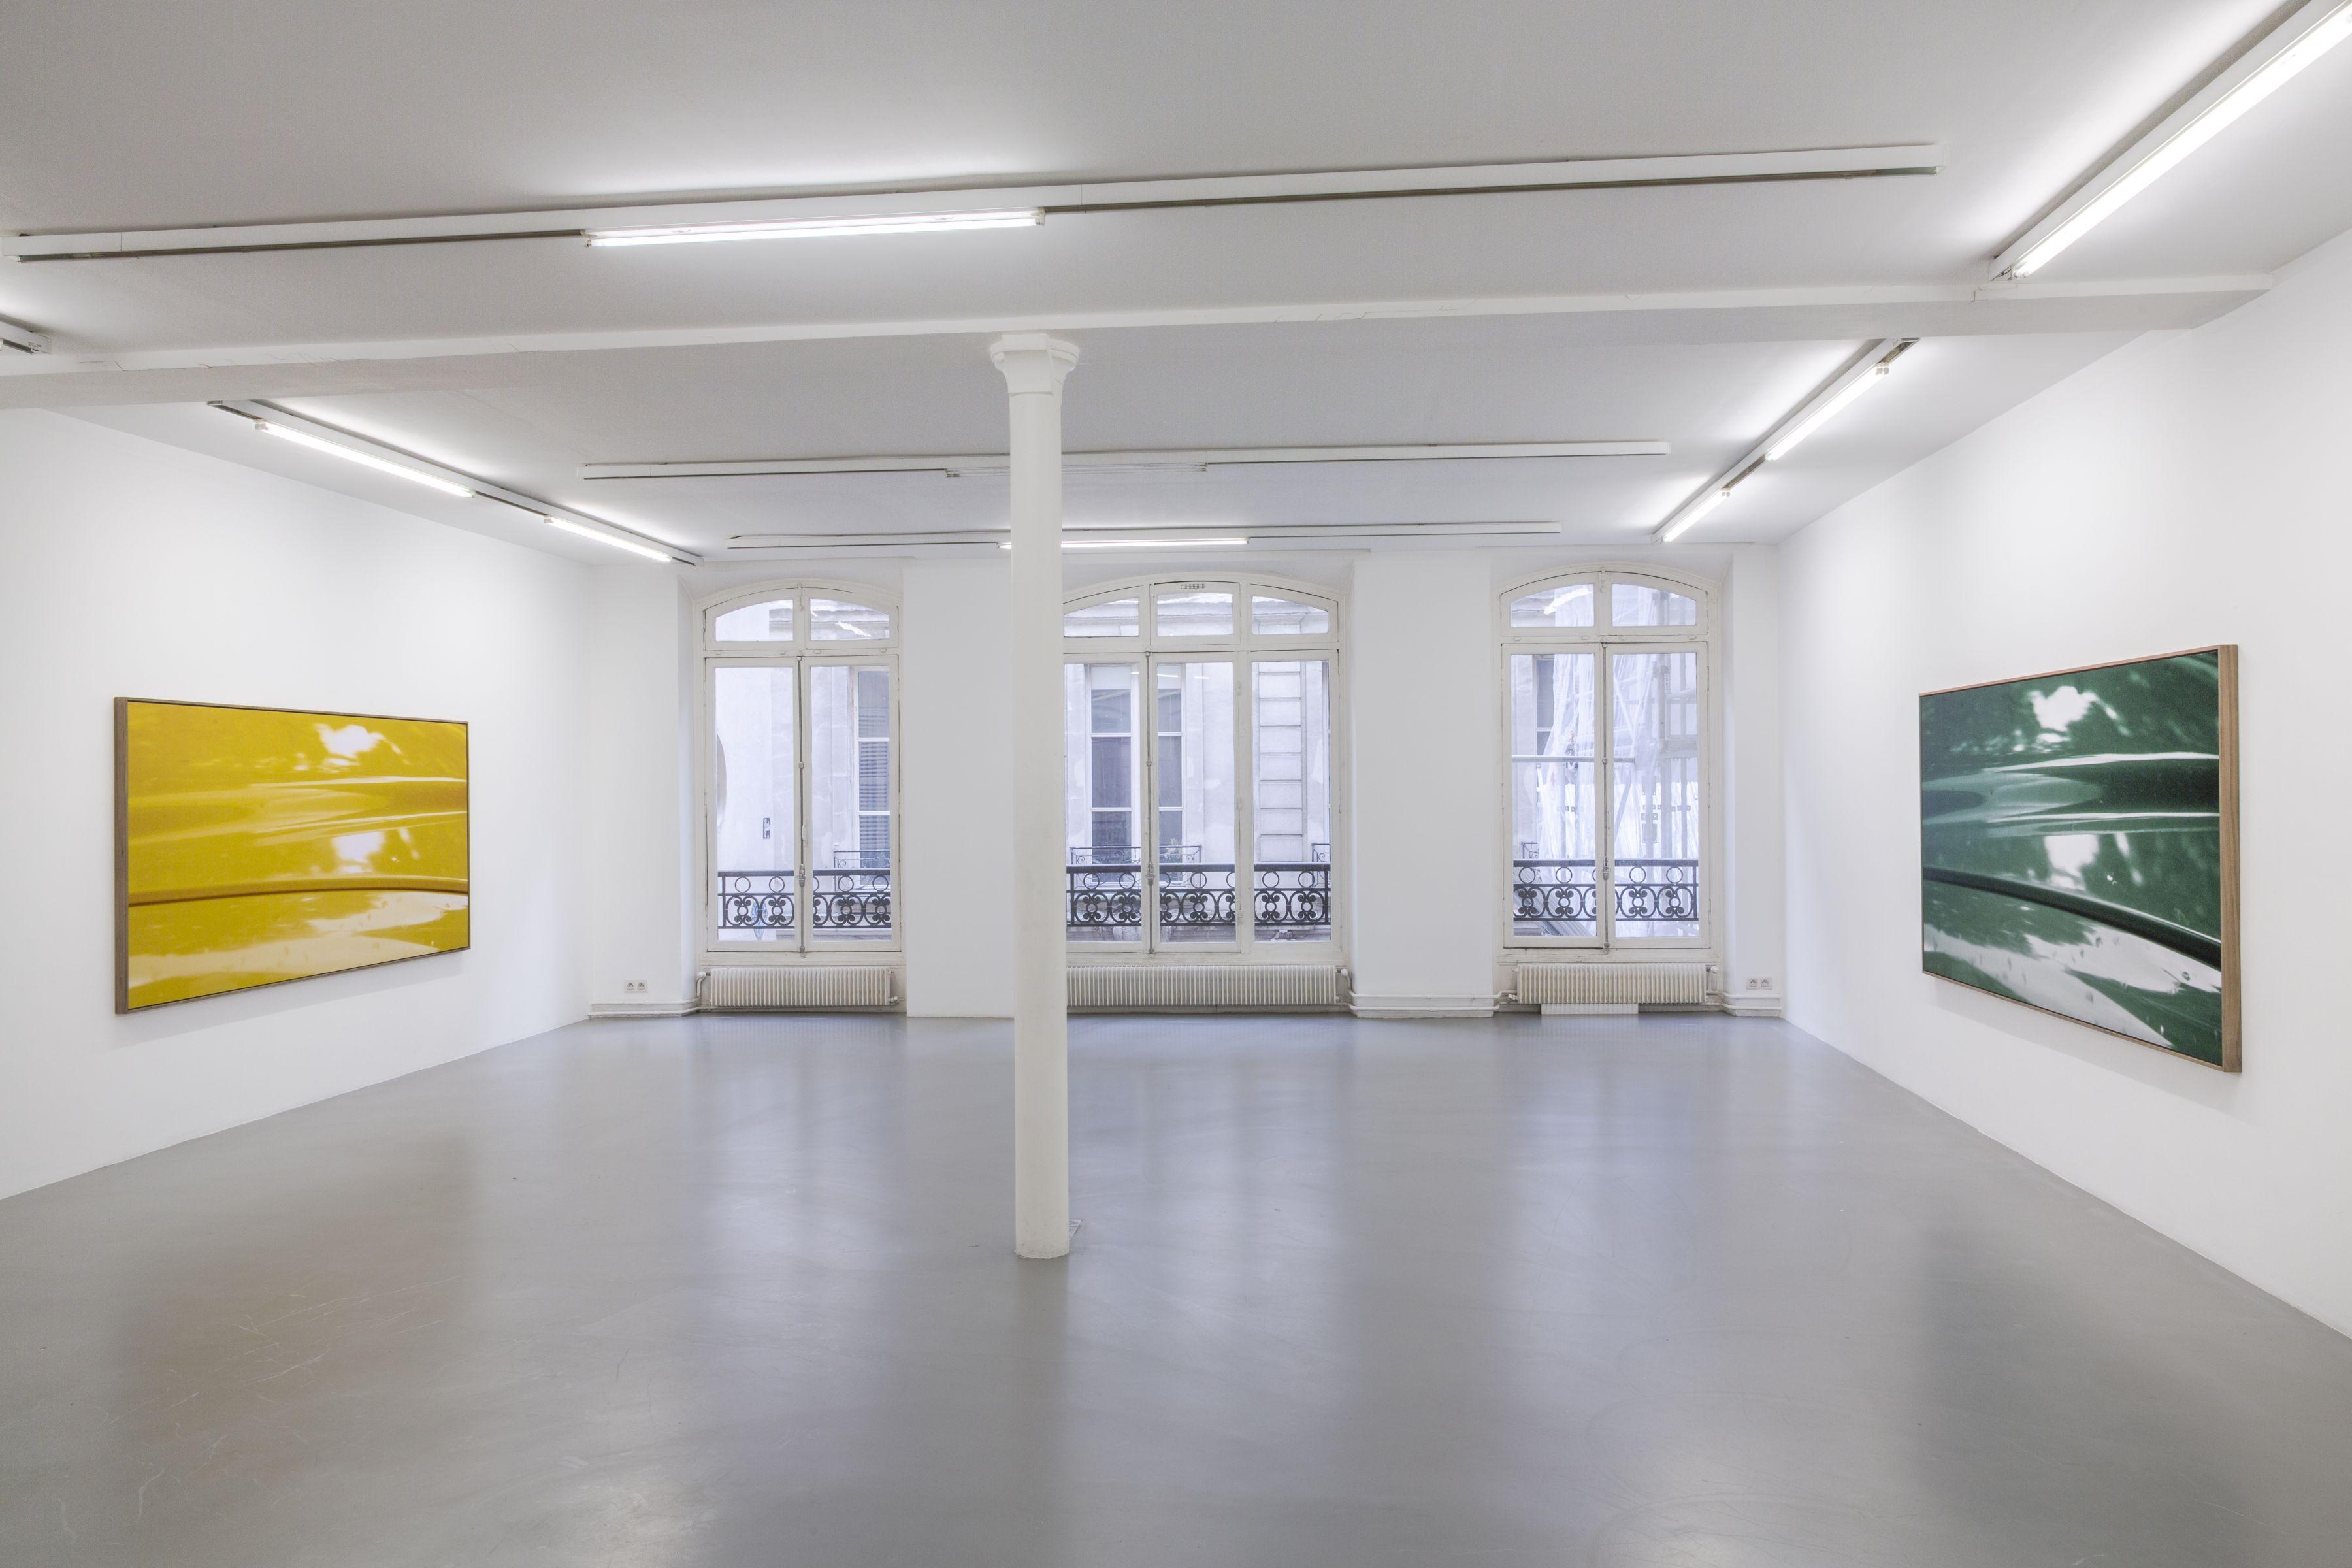 Jan Dibbets: New Colorstudies 1976/2012 – installation view 5